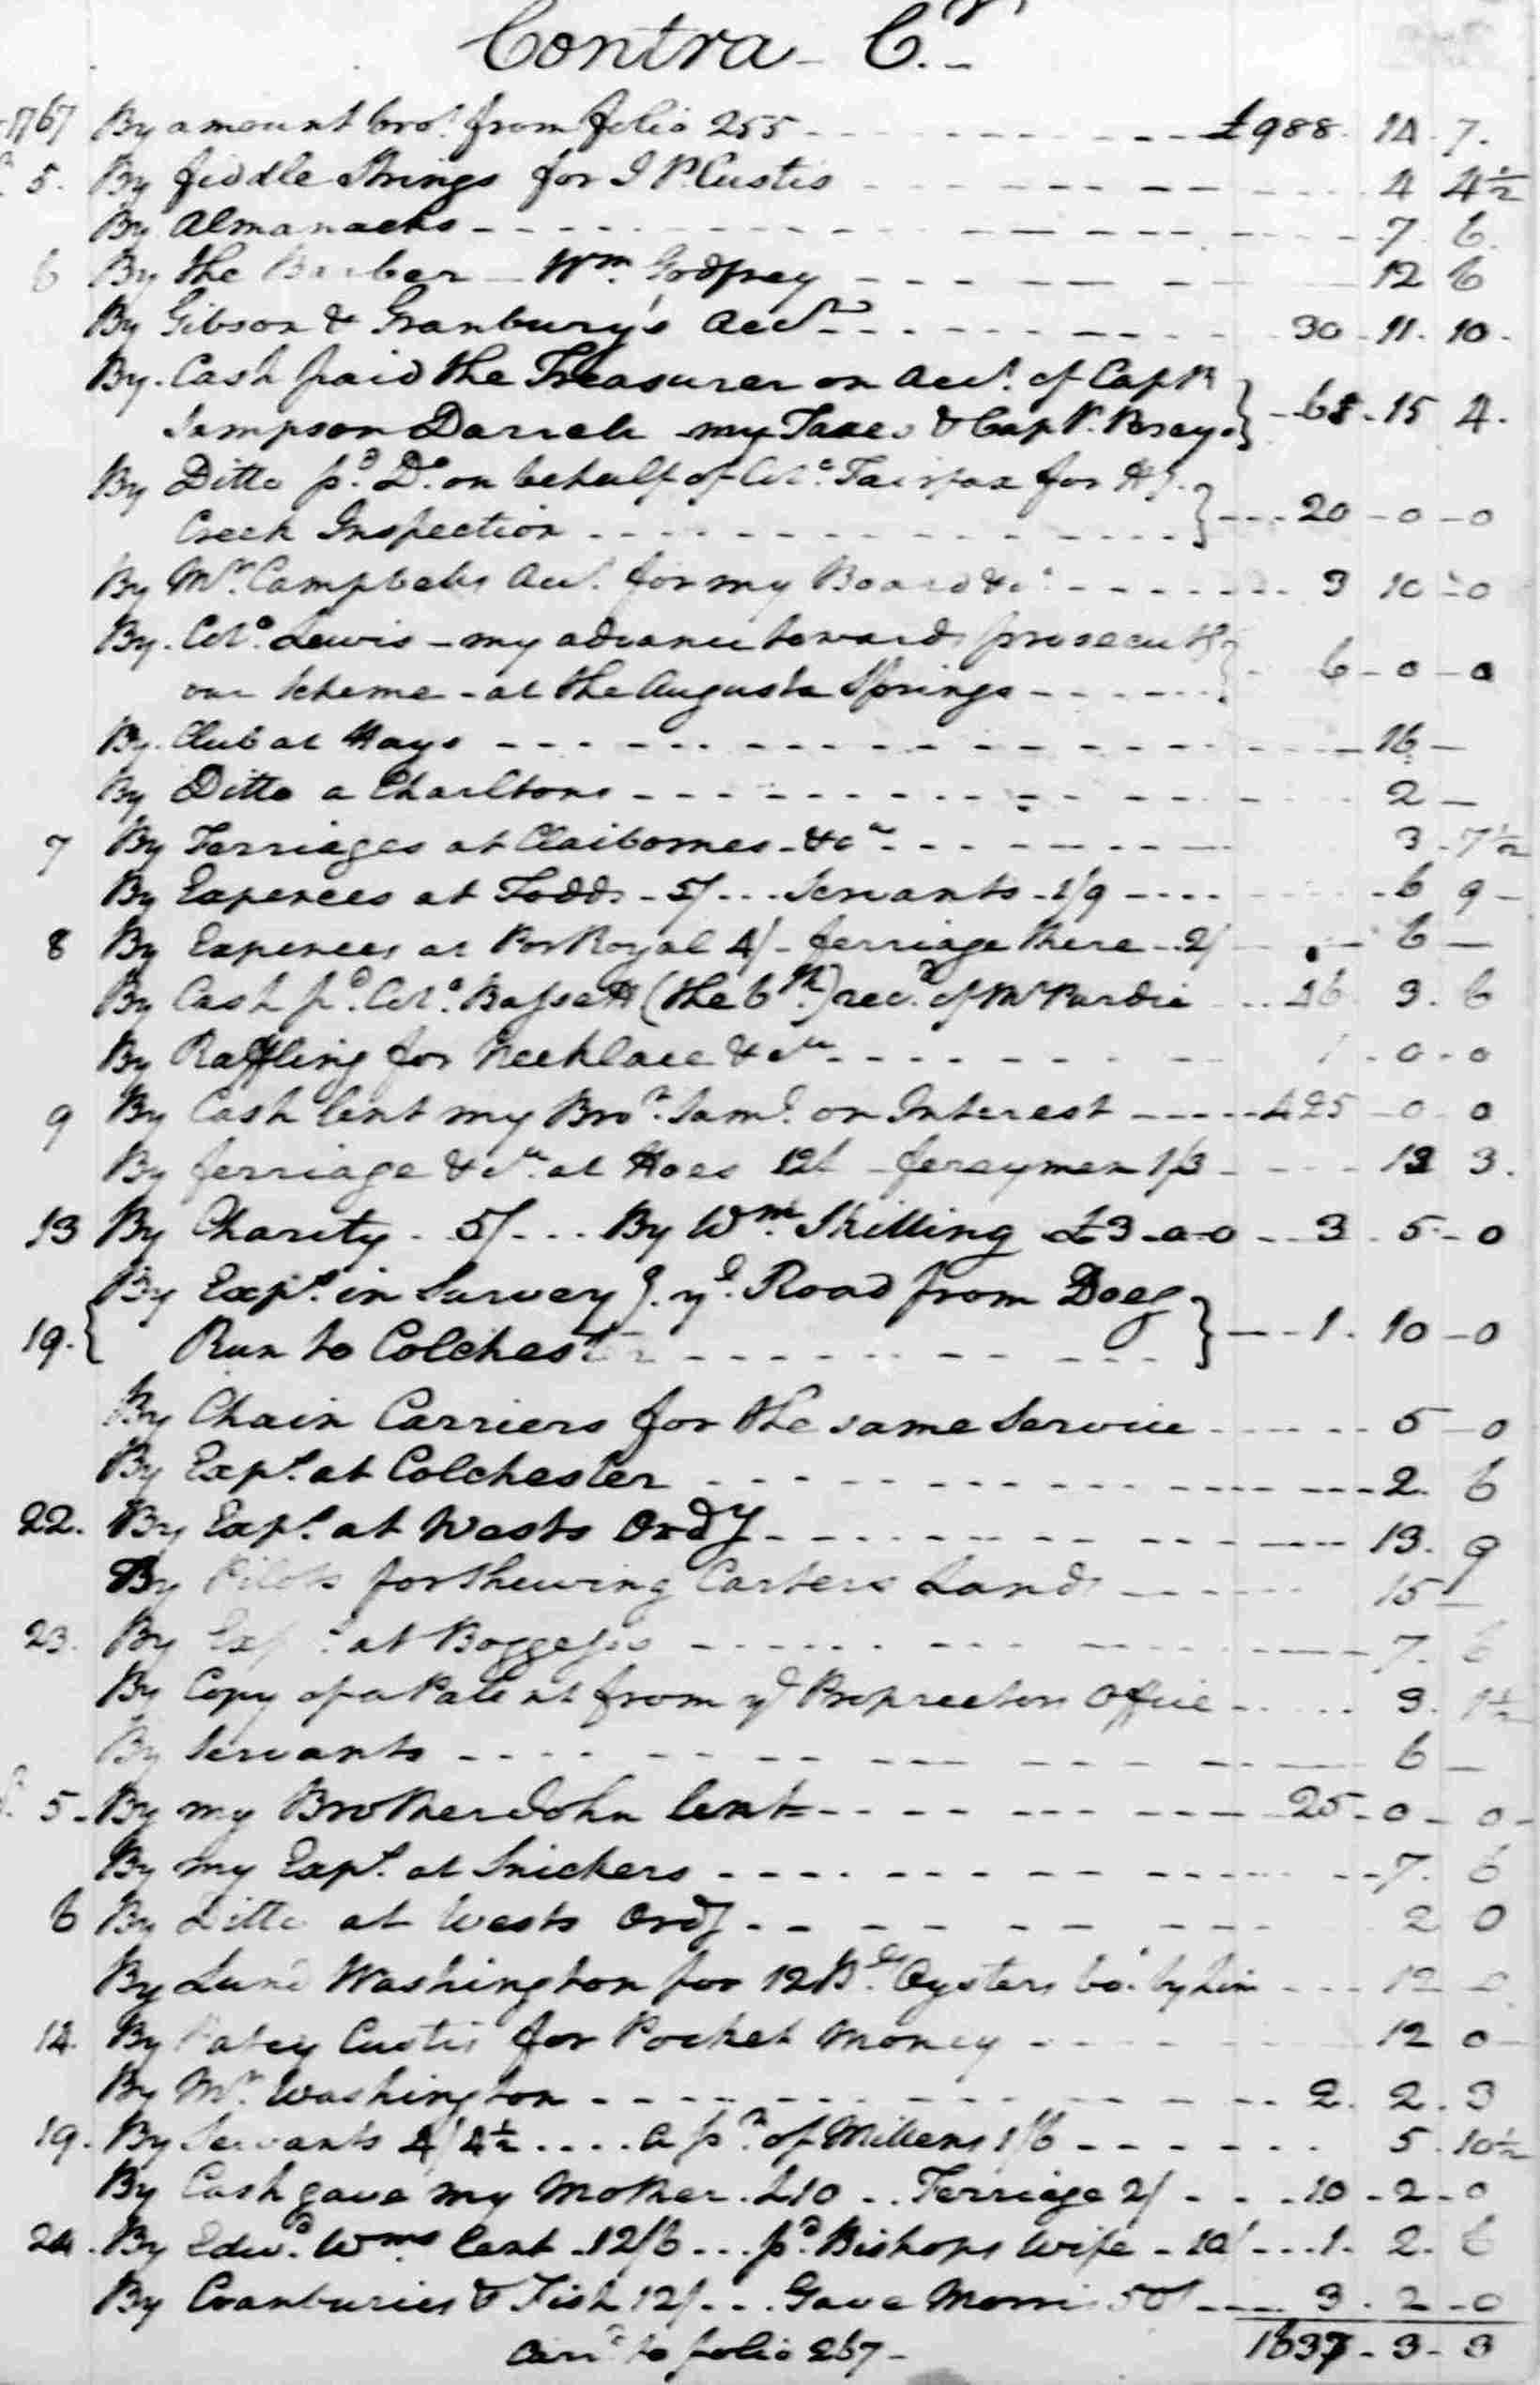 Ledger A, folio 262, right side